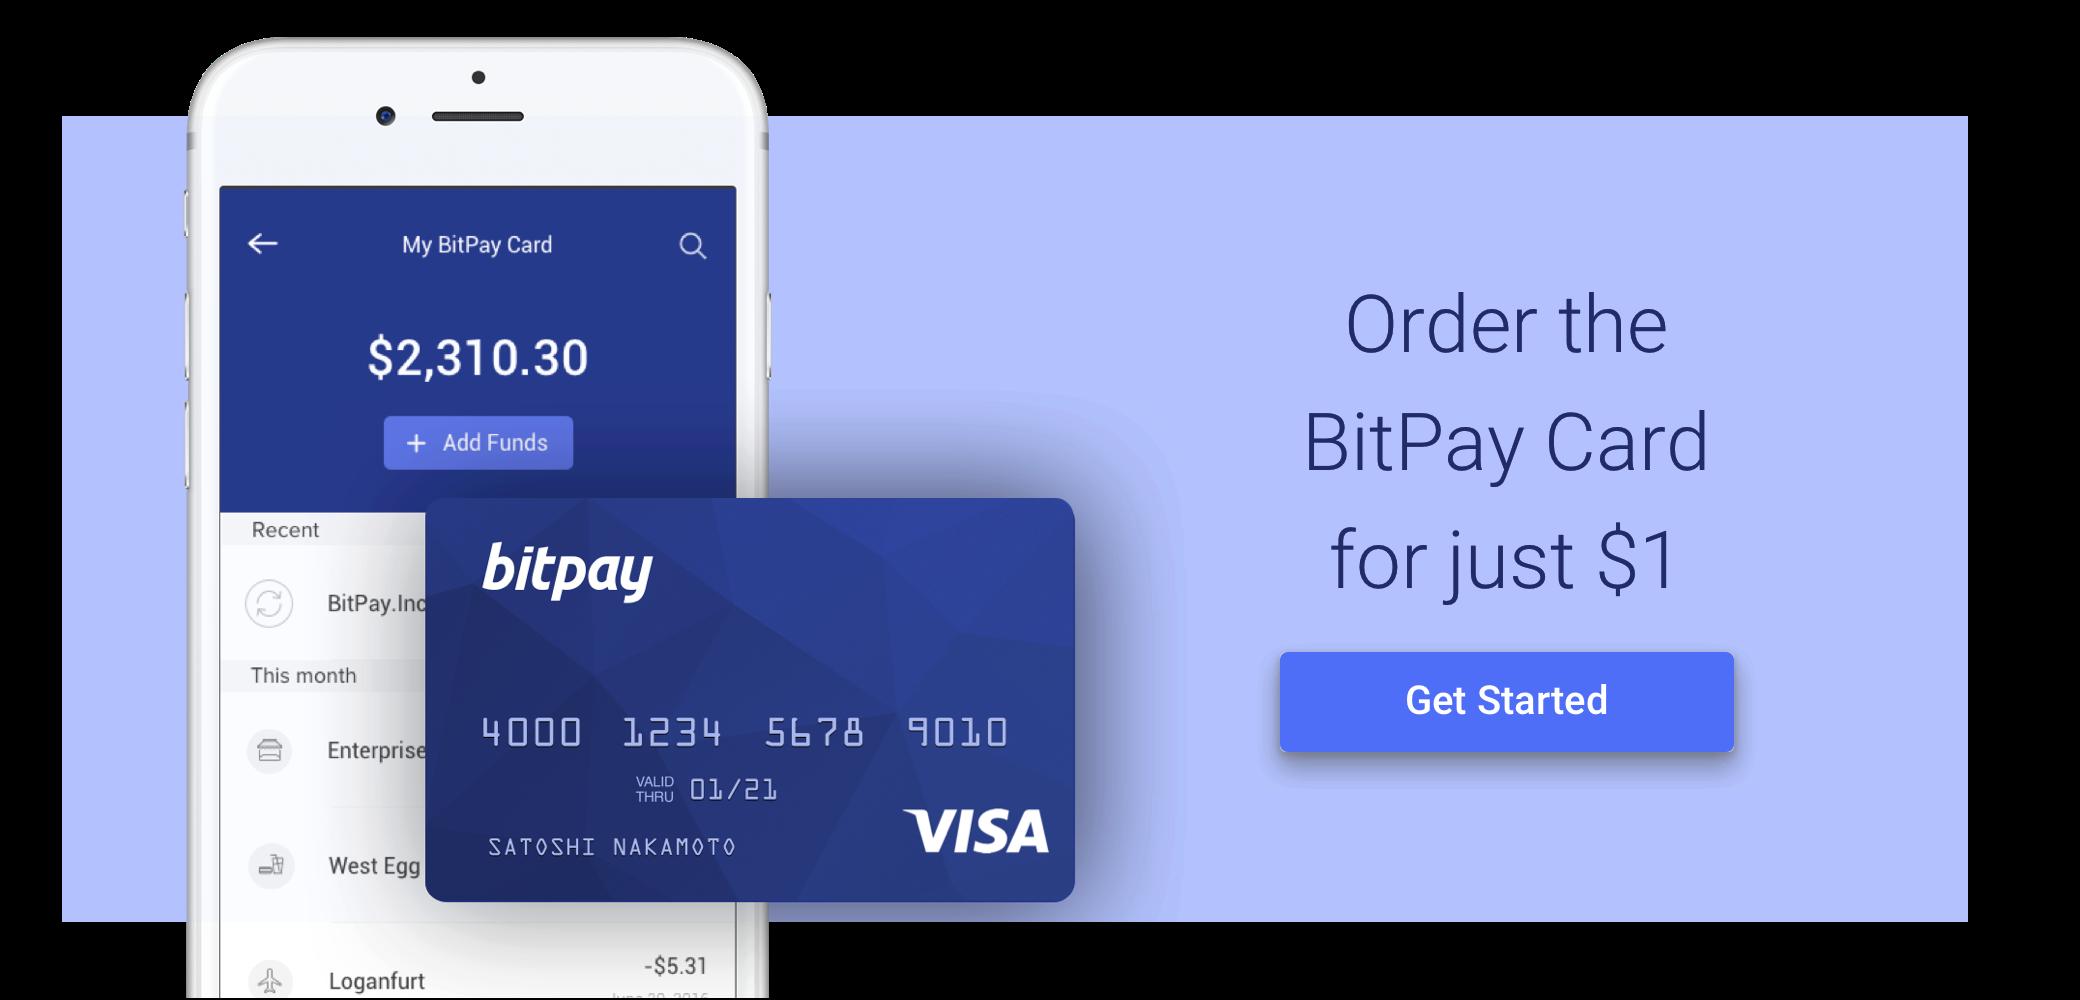 bitpay-card-promo-cta-4